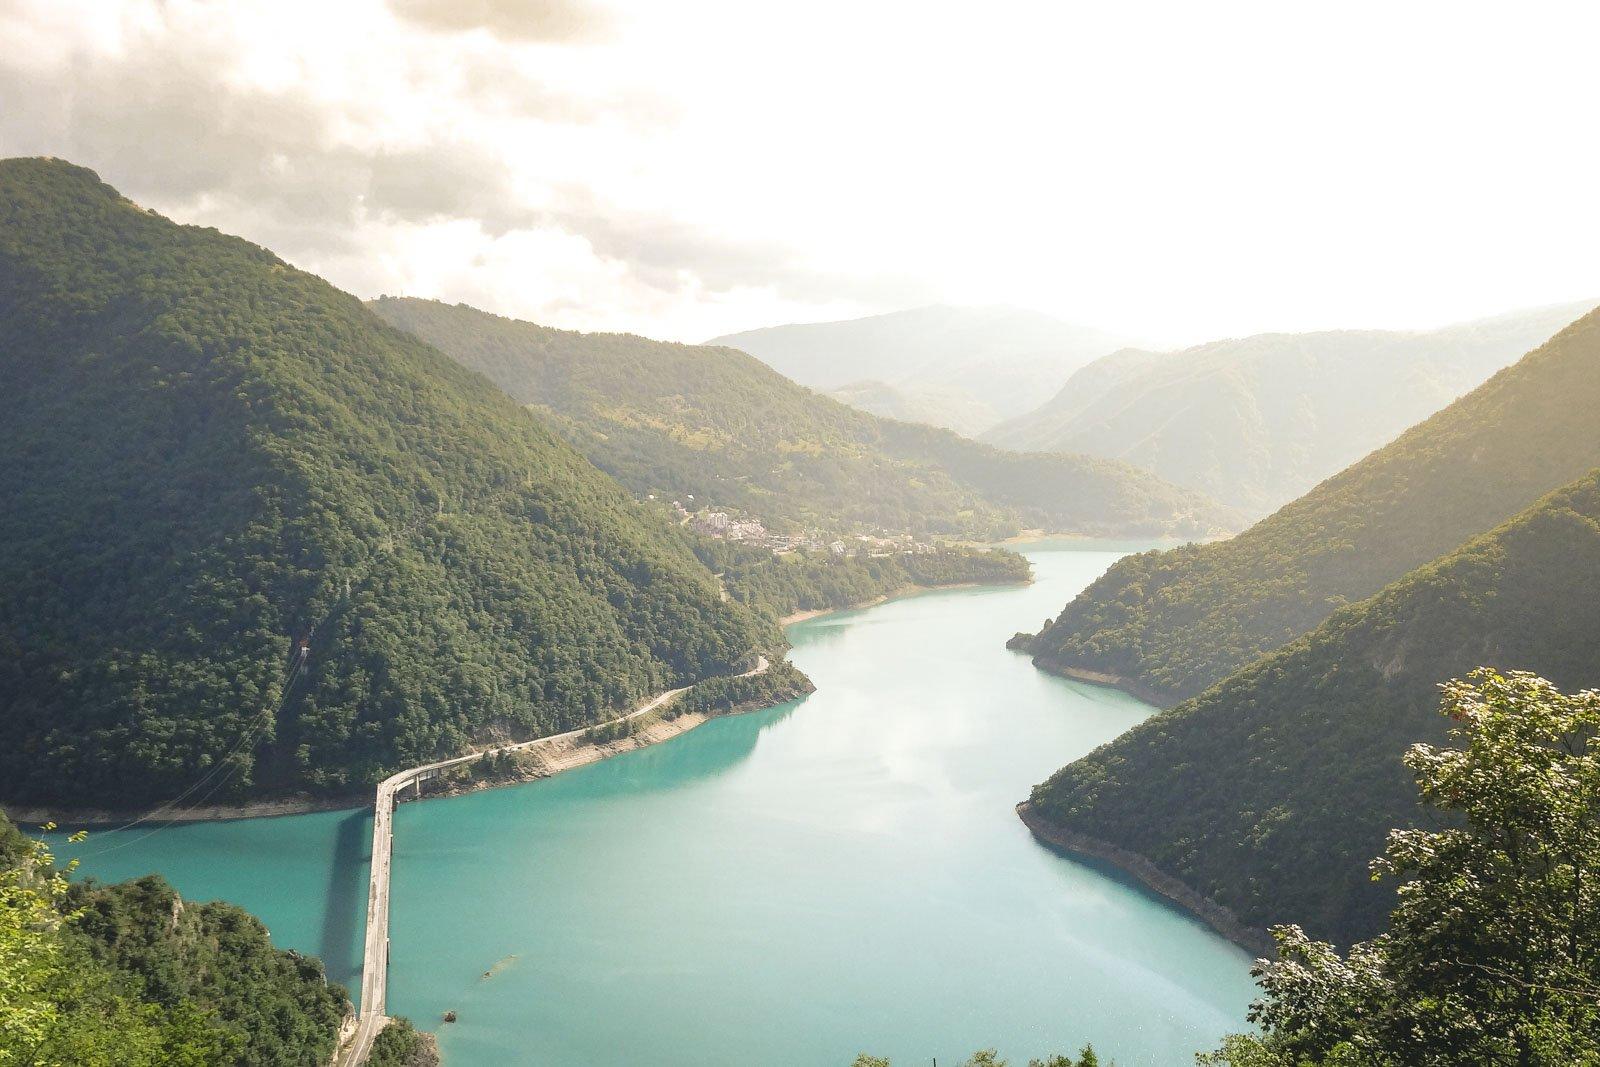 balkans-viewpoint-motorcycle-europe